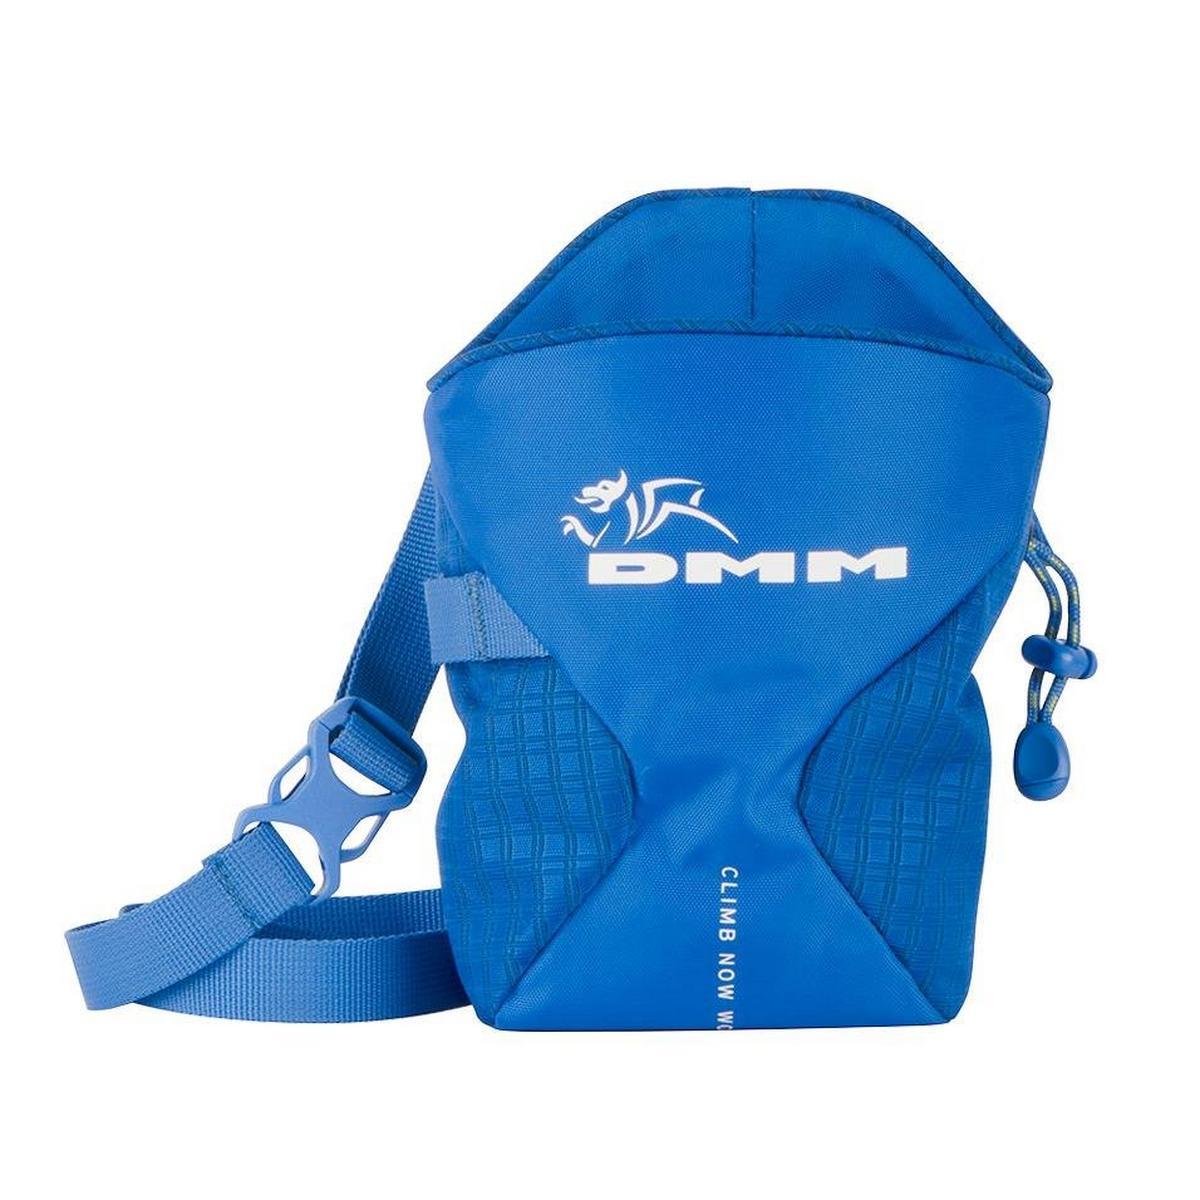 Dmm Traction Chalk Bag - Blue